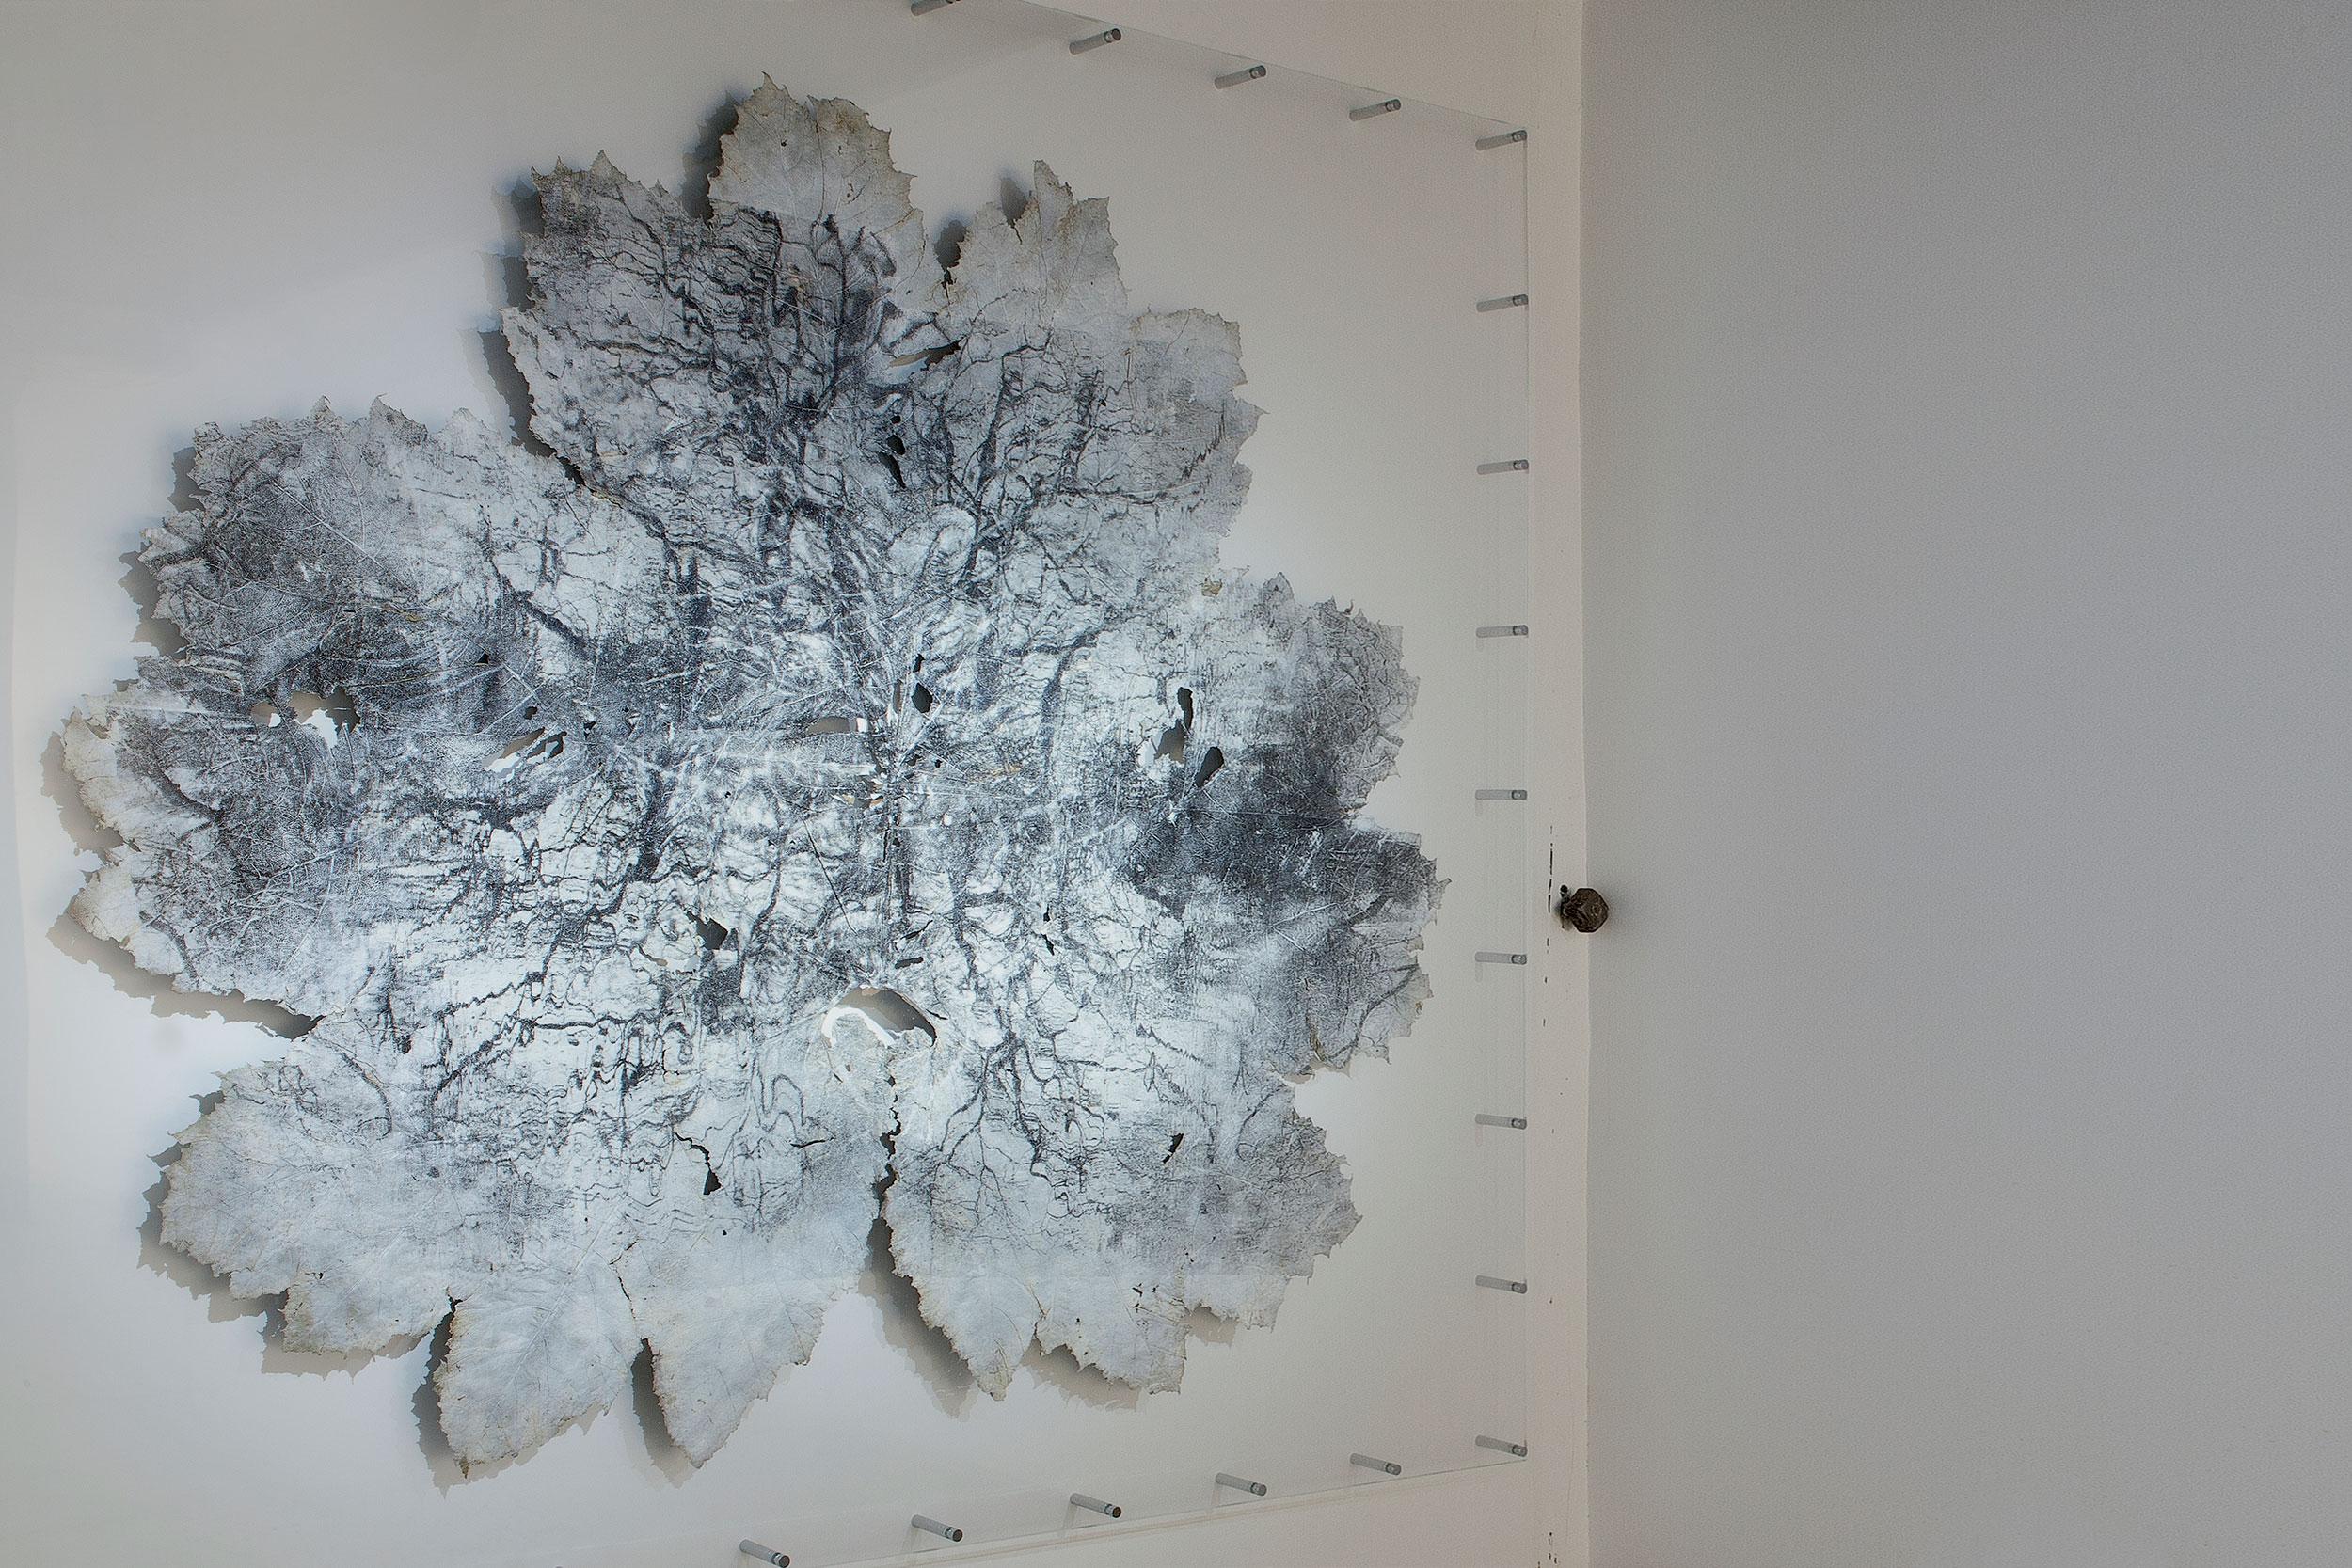 Silver gelatin print on Gunnera Manicata leaf - Untitled - 270 cm x 240cm - Dominique Lacloche